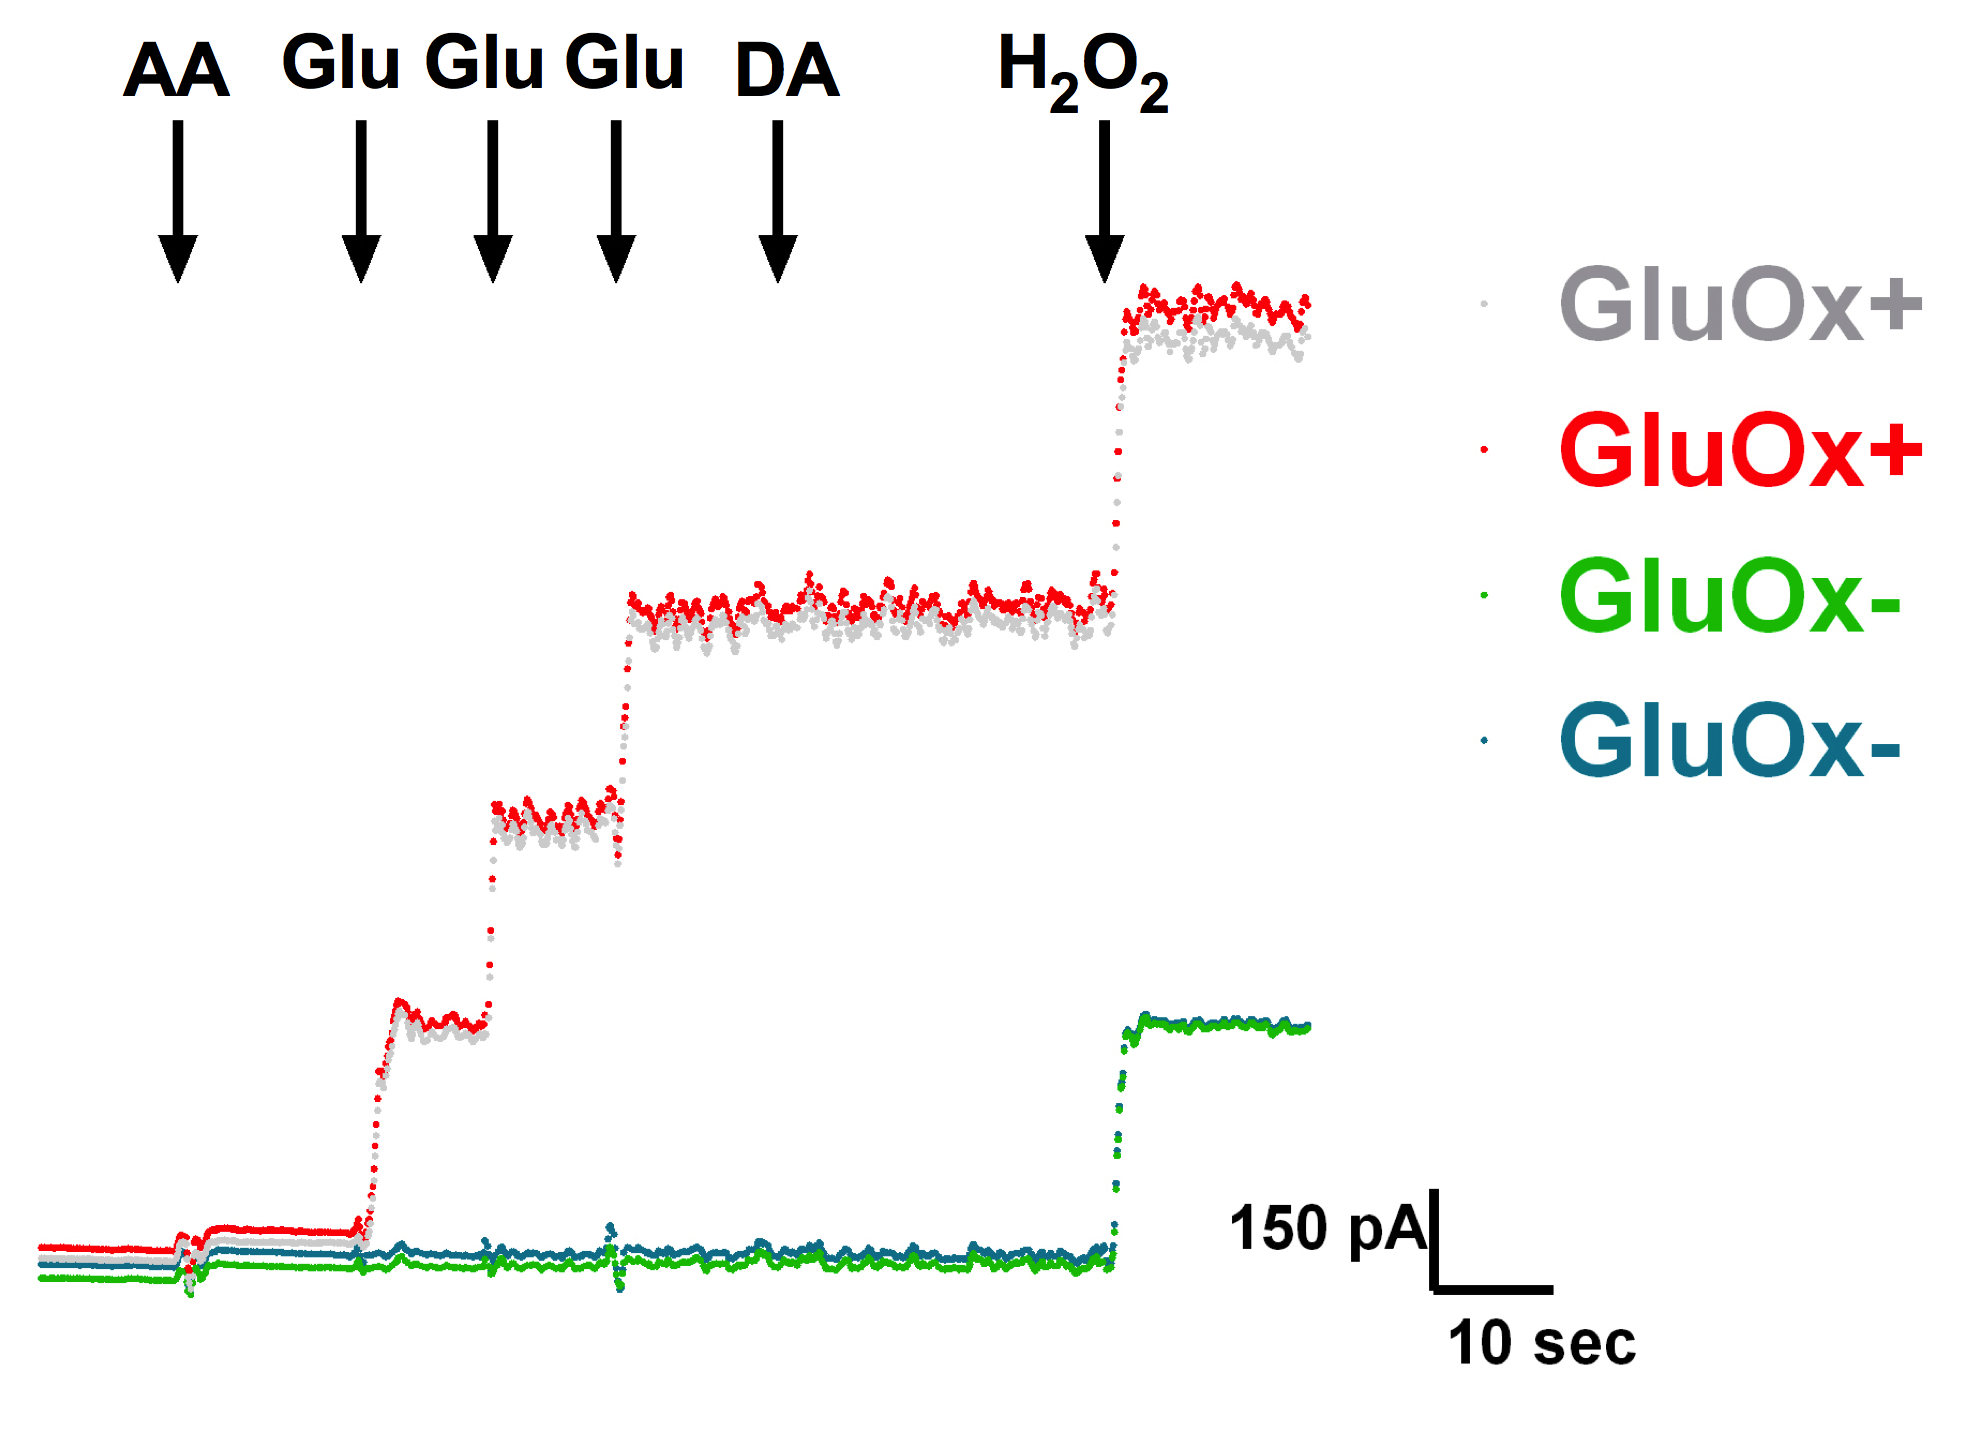 Using Enzyme-based Biosensors to Measure Tonic and Phasic Glutamate